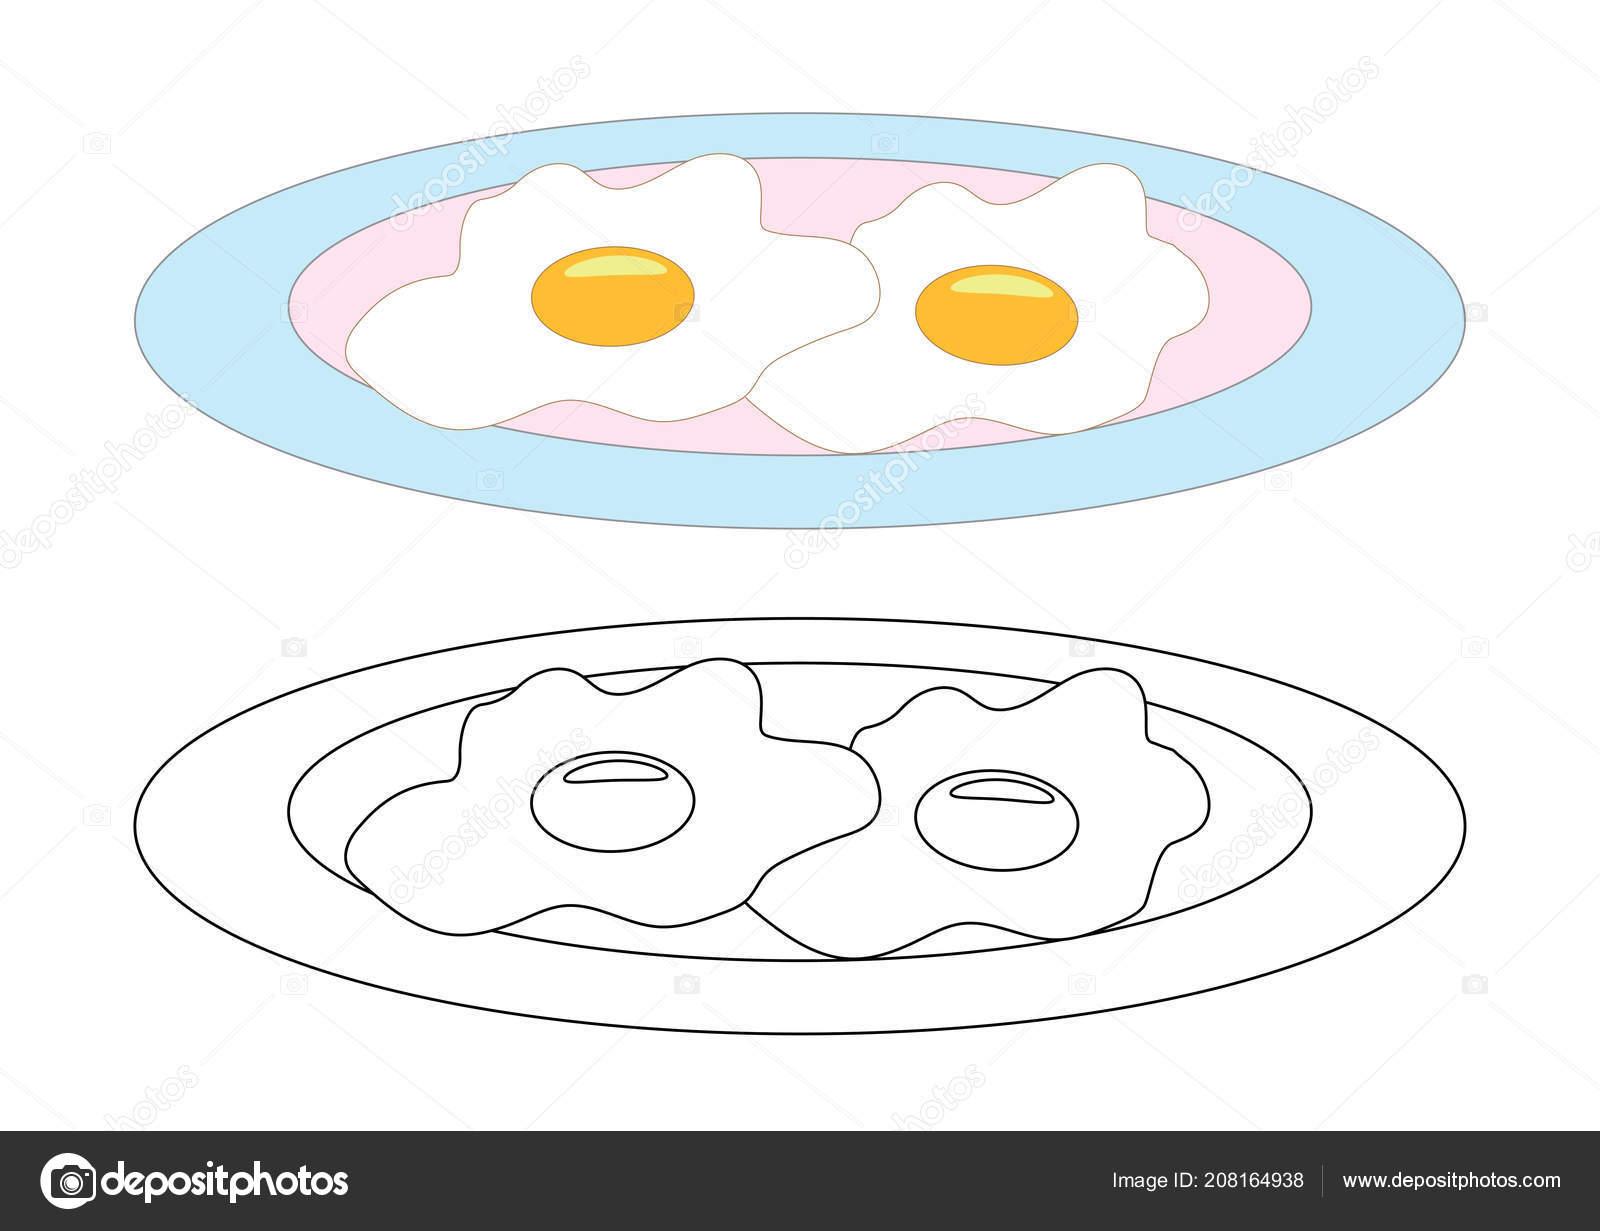 Bacon and Eggs Sketch Stock Vectors, Images & Vector Art | Shutterstock | 1231x1600